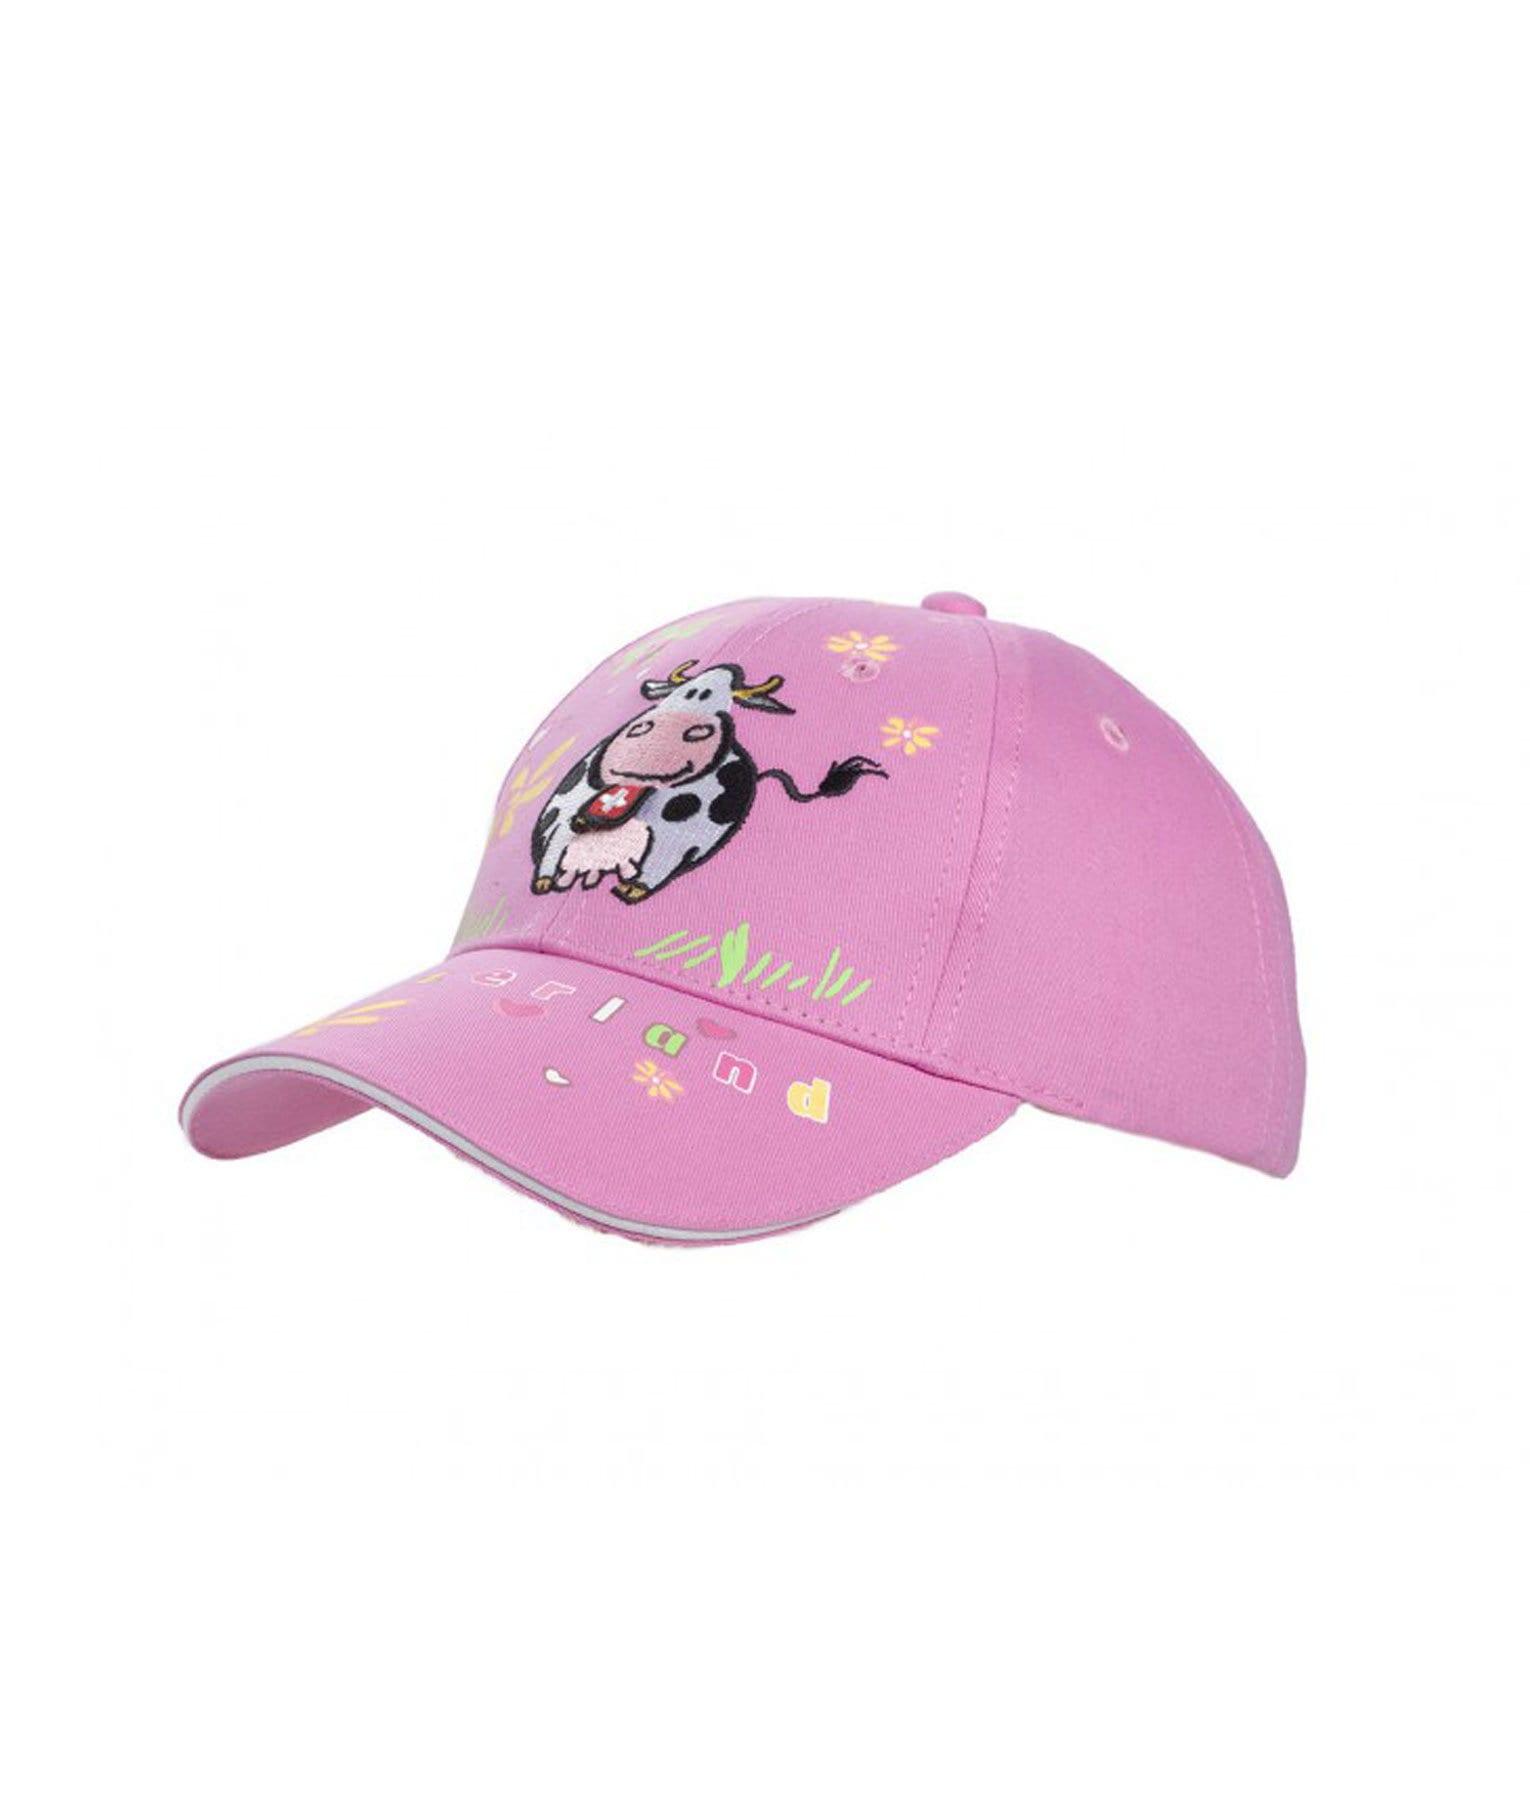 kids-baseball-cap-swissmade-direct